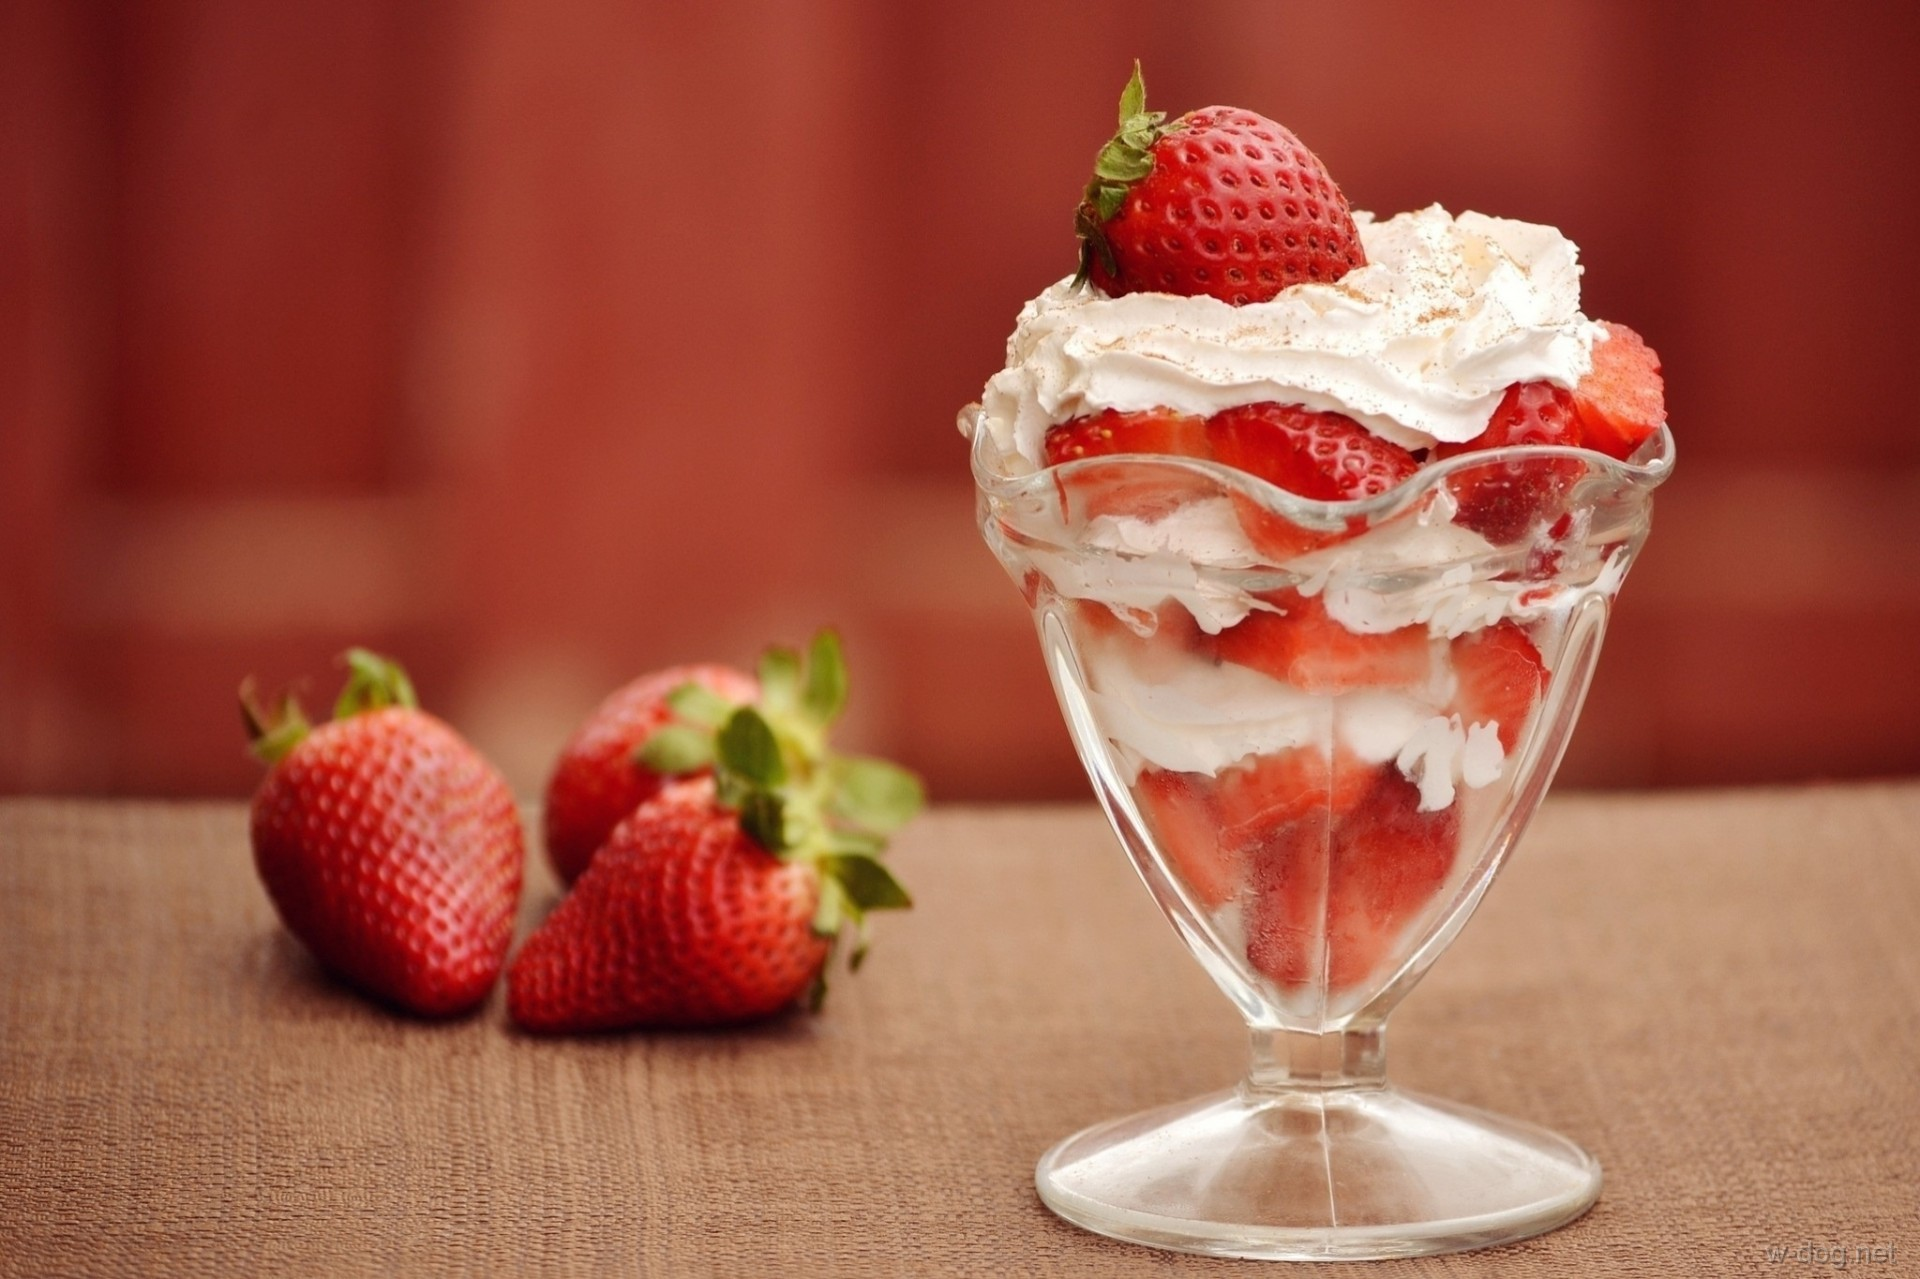 еда клубника лед food strawberry ice скачать